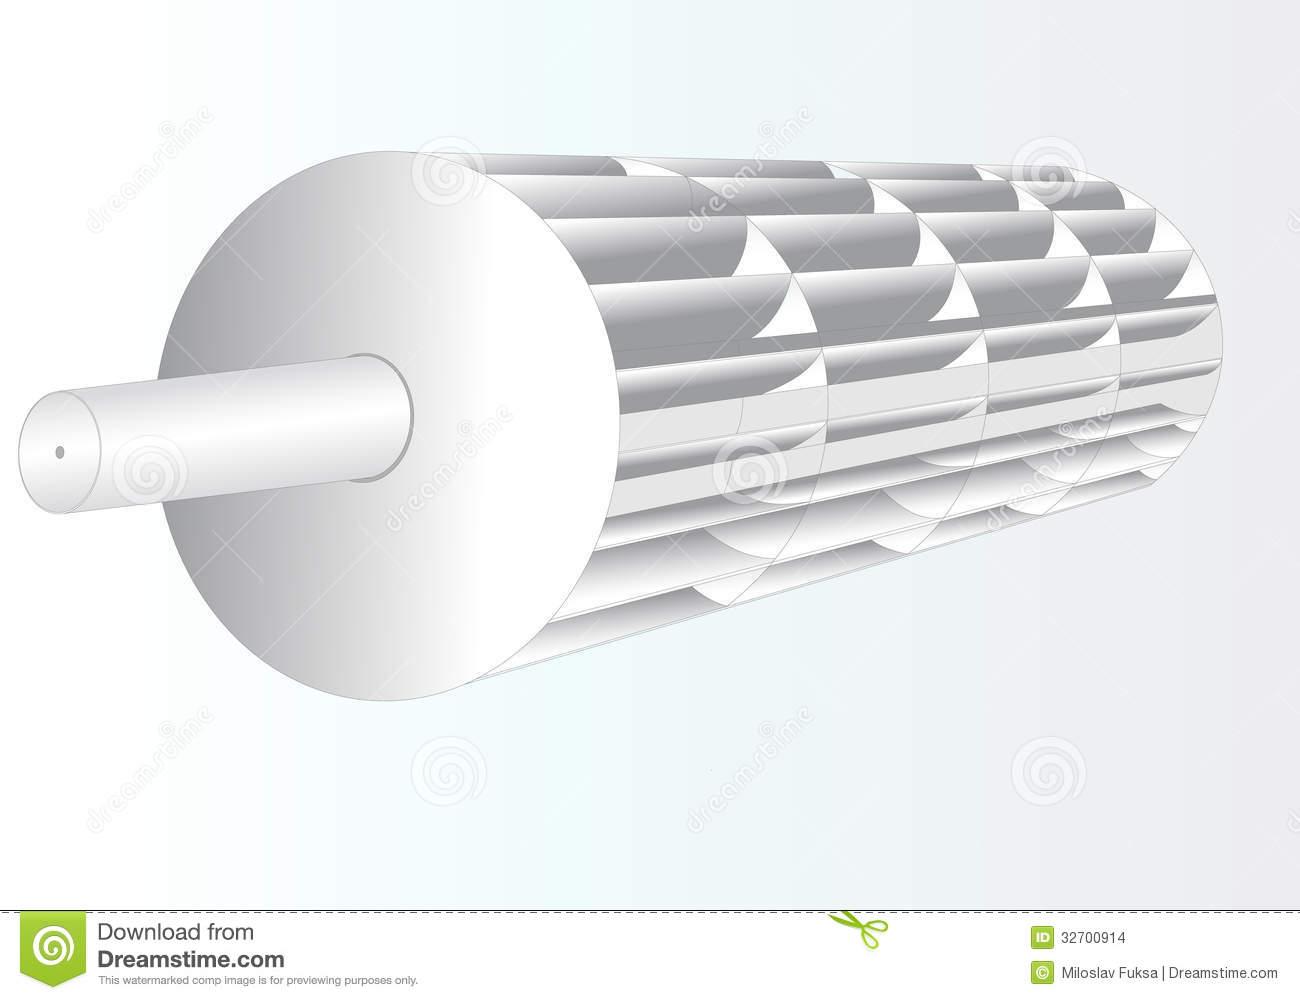 Water turbine clipart.